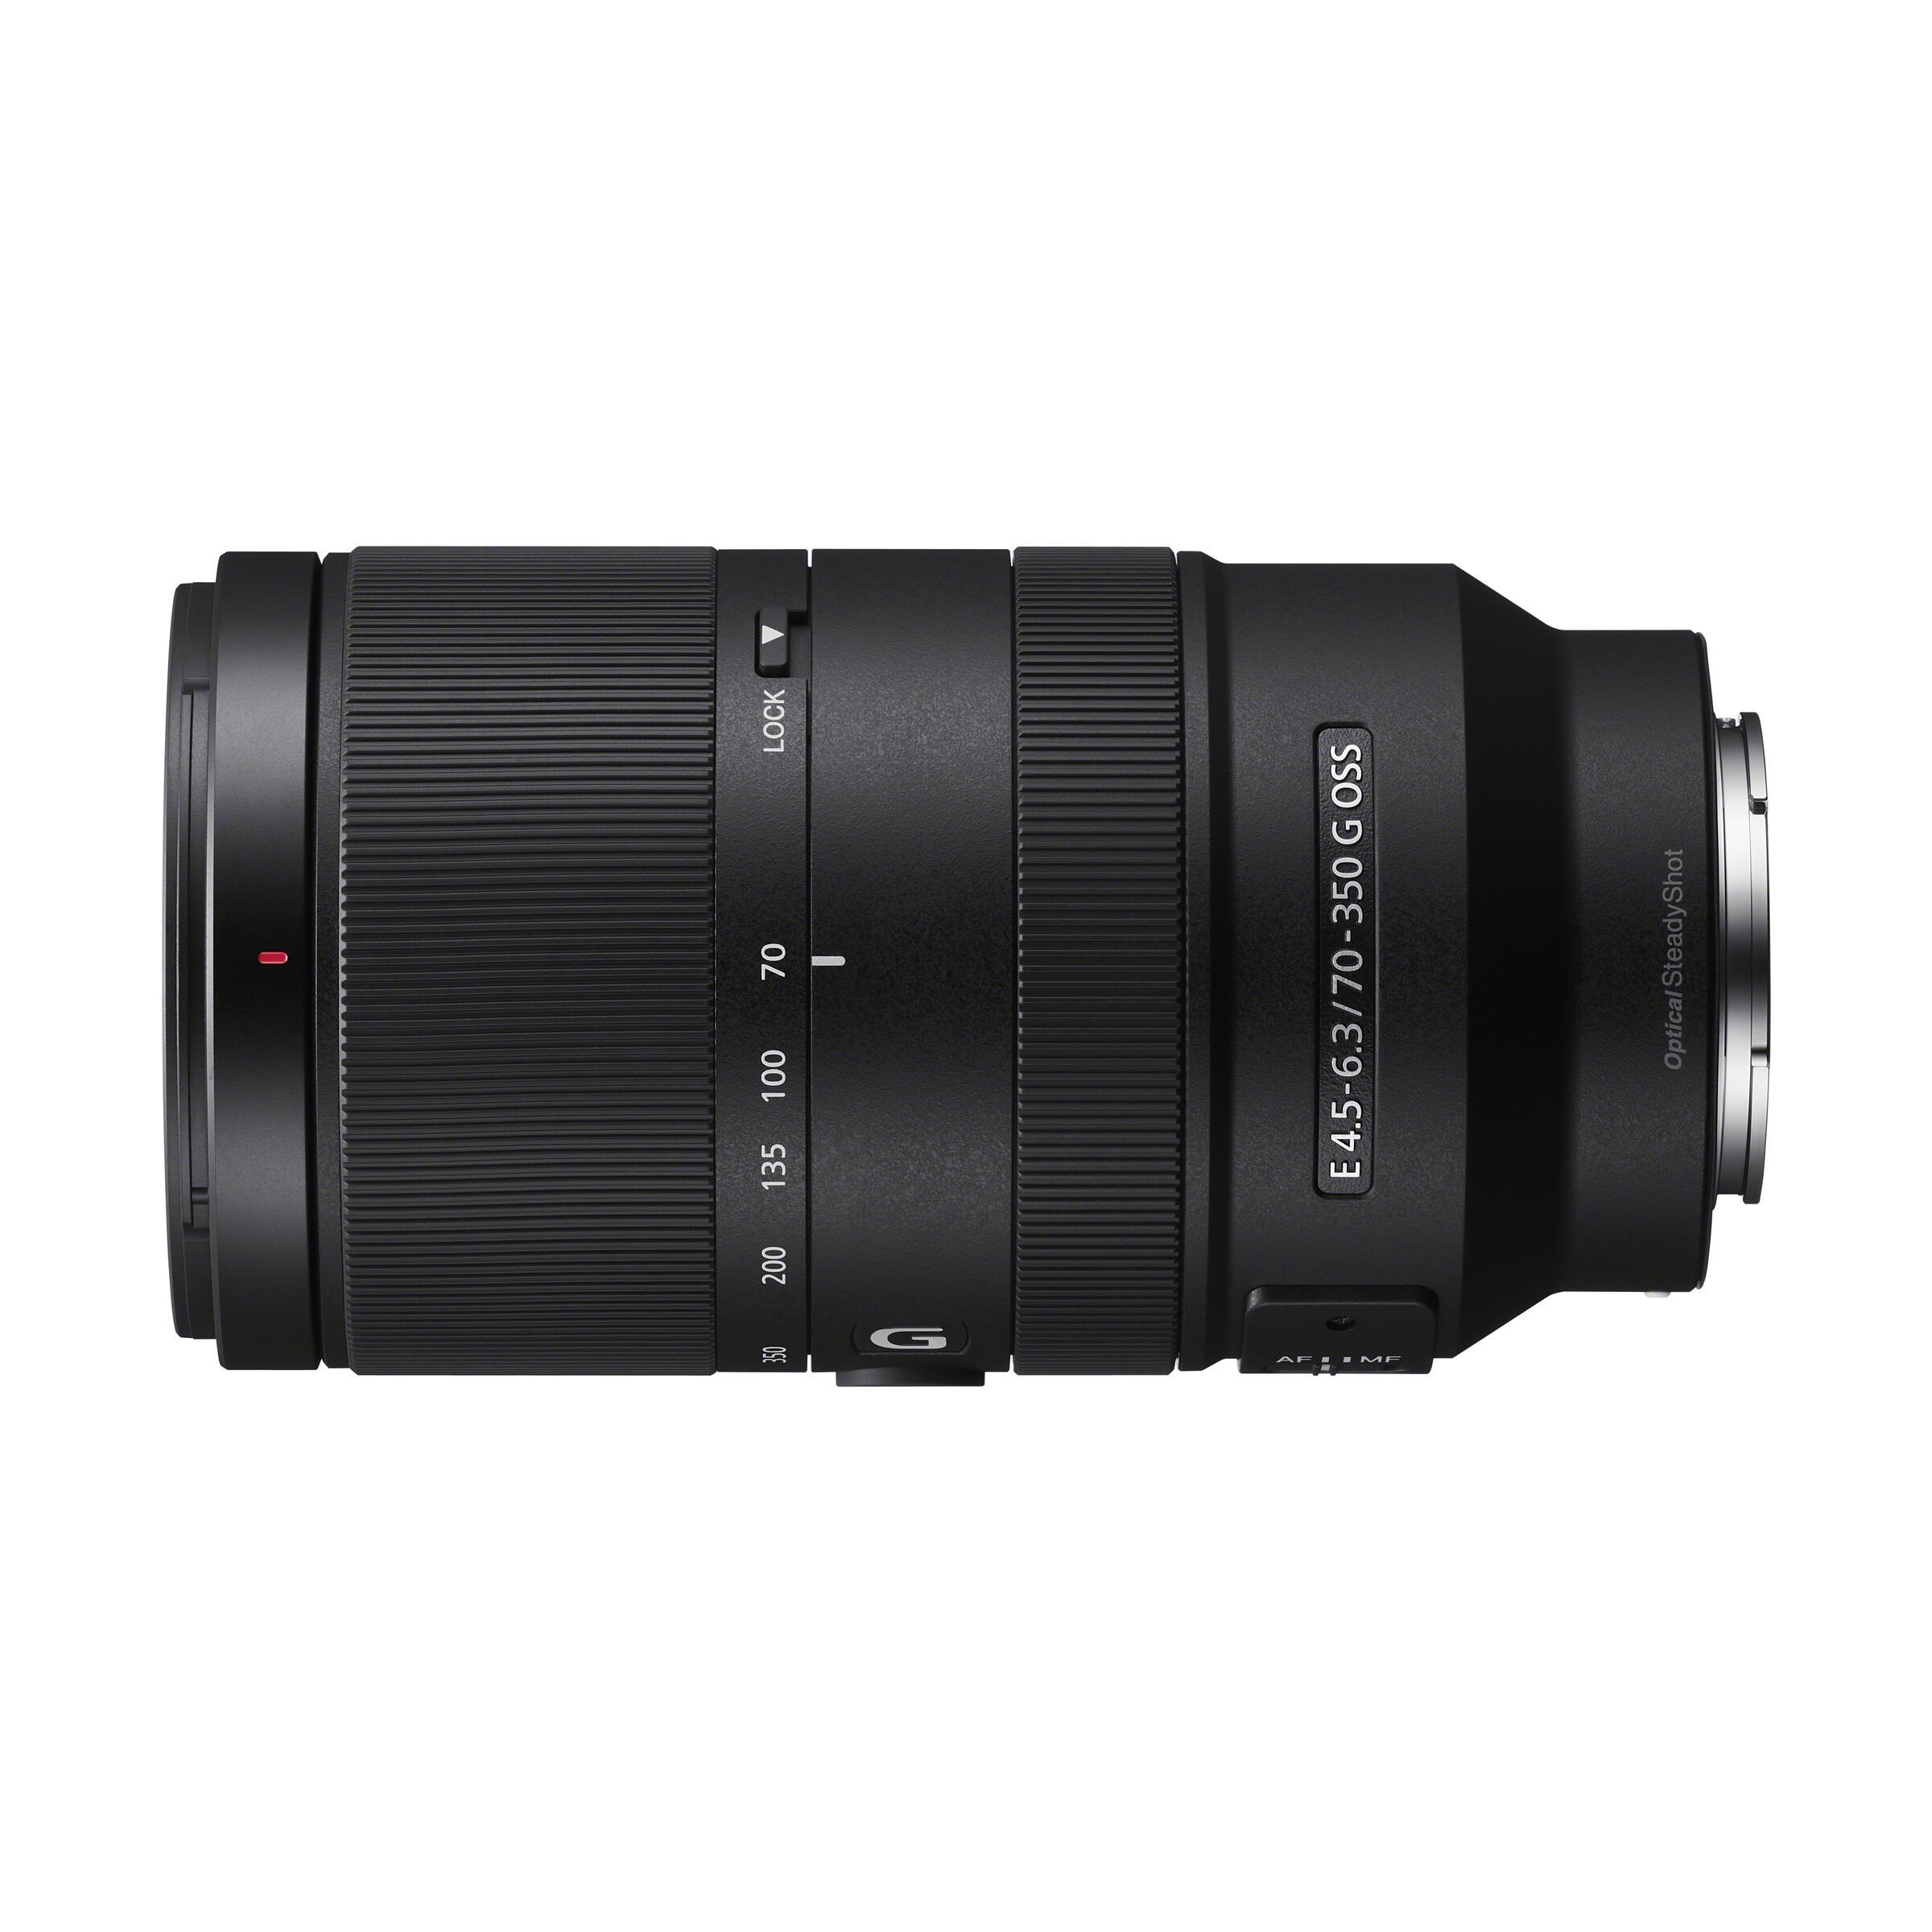 Sony E 70-350mm f/4,5-6,3 G OSS